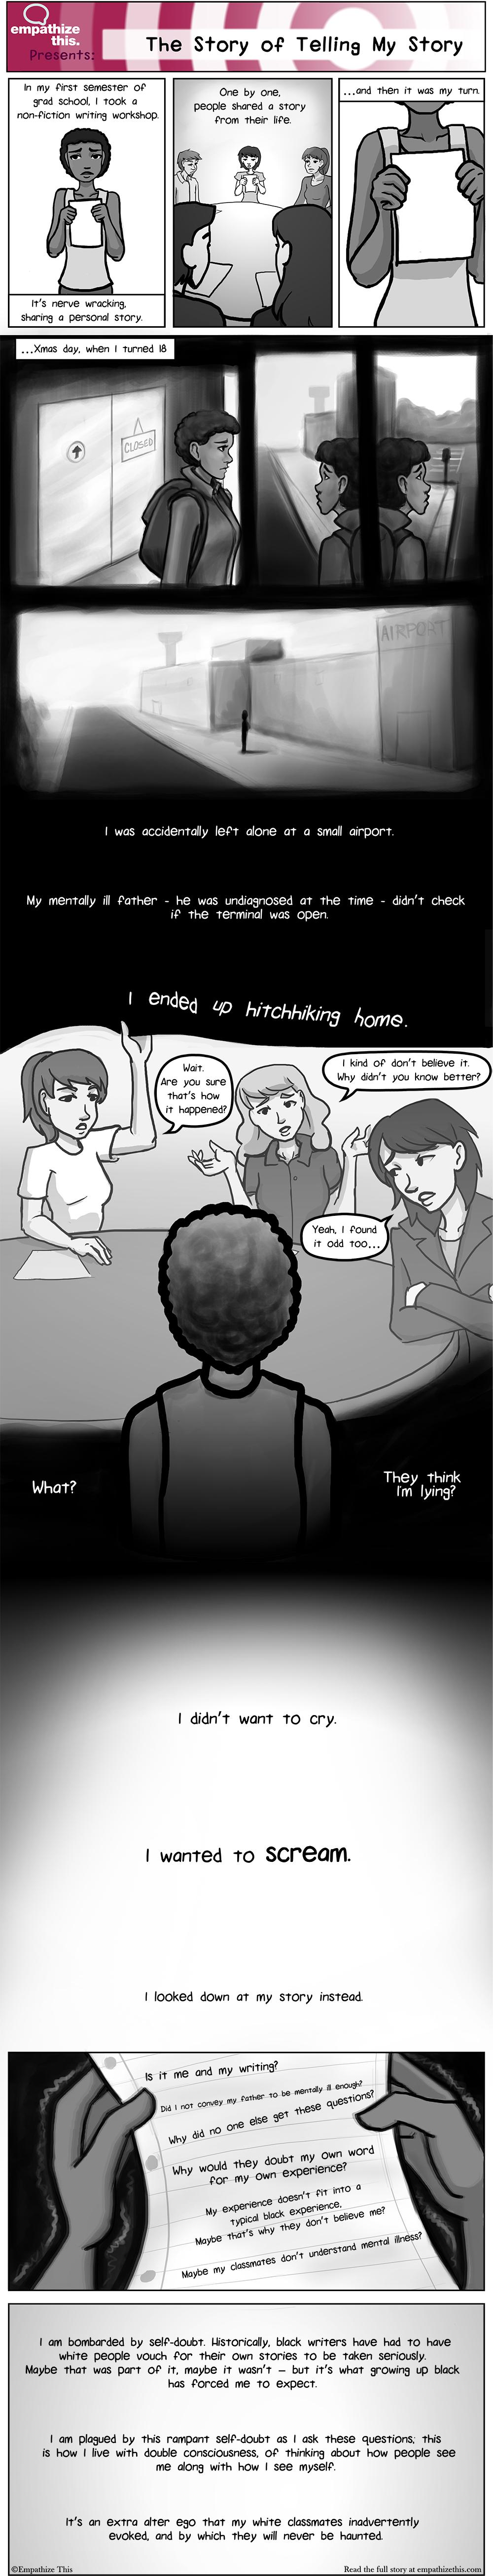 Comic image.